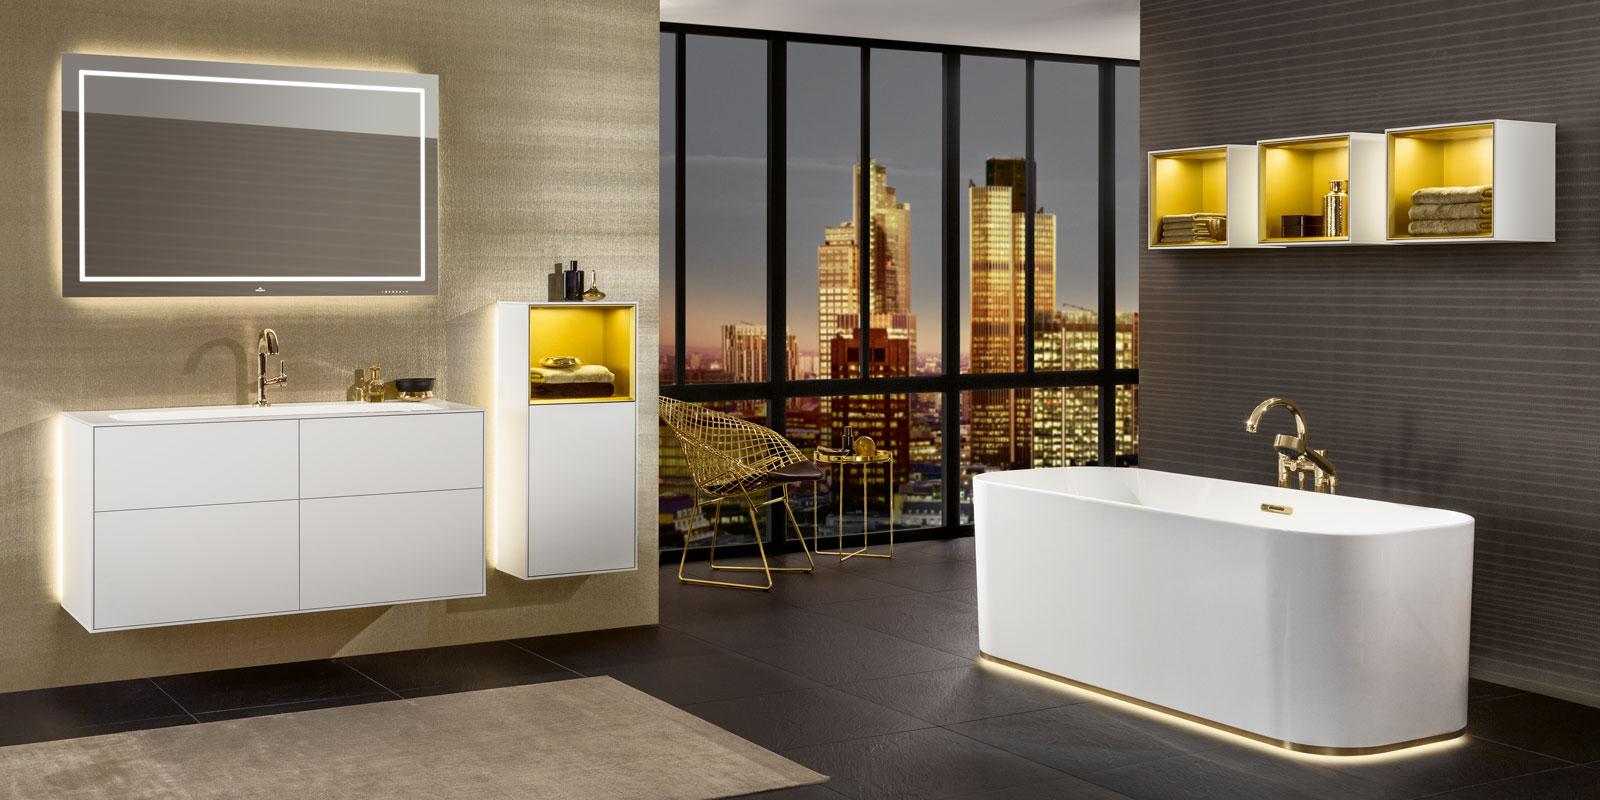 luxe badkamer, villeroy & boch, vrijstaand bad, wastafel badkamer, complete badkamer